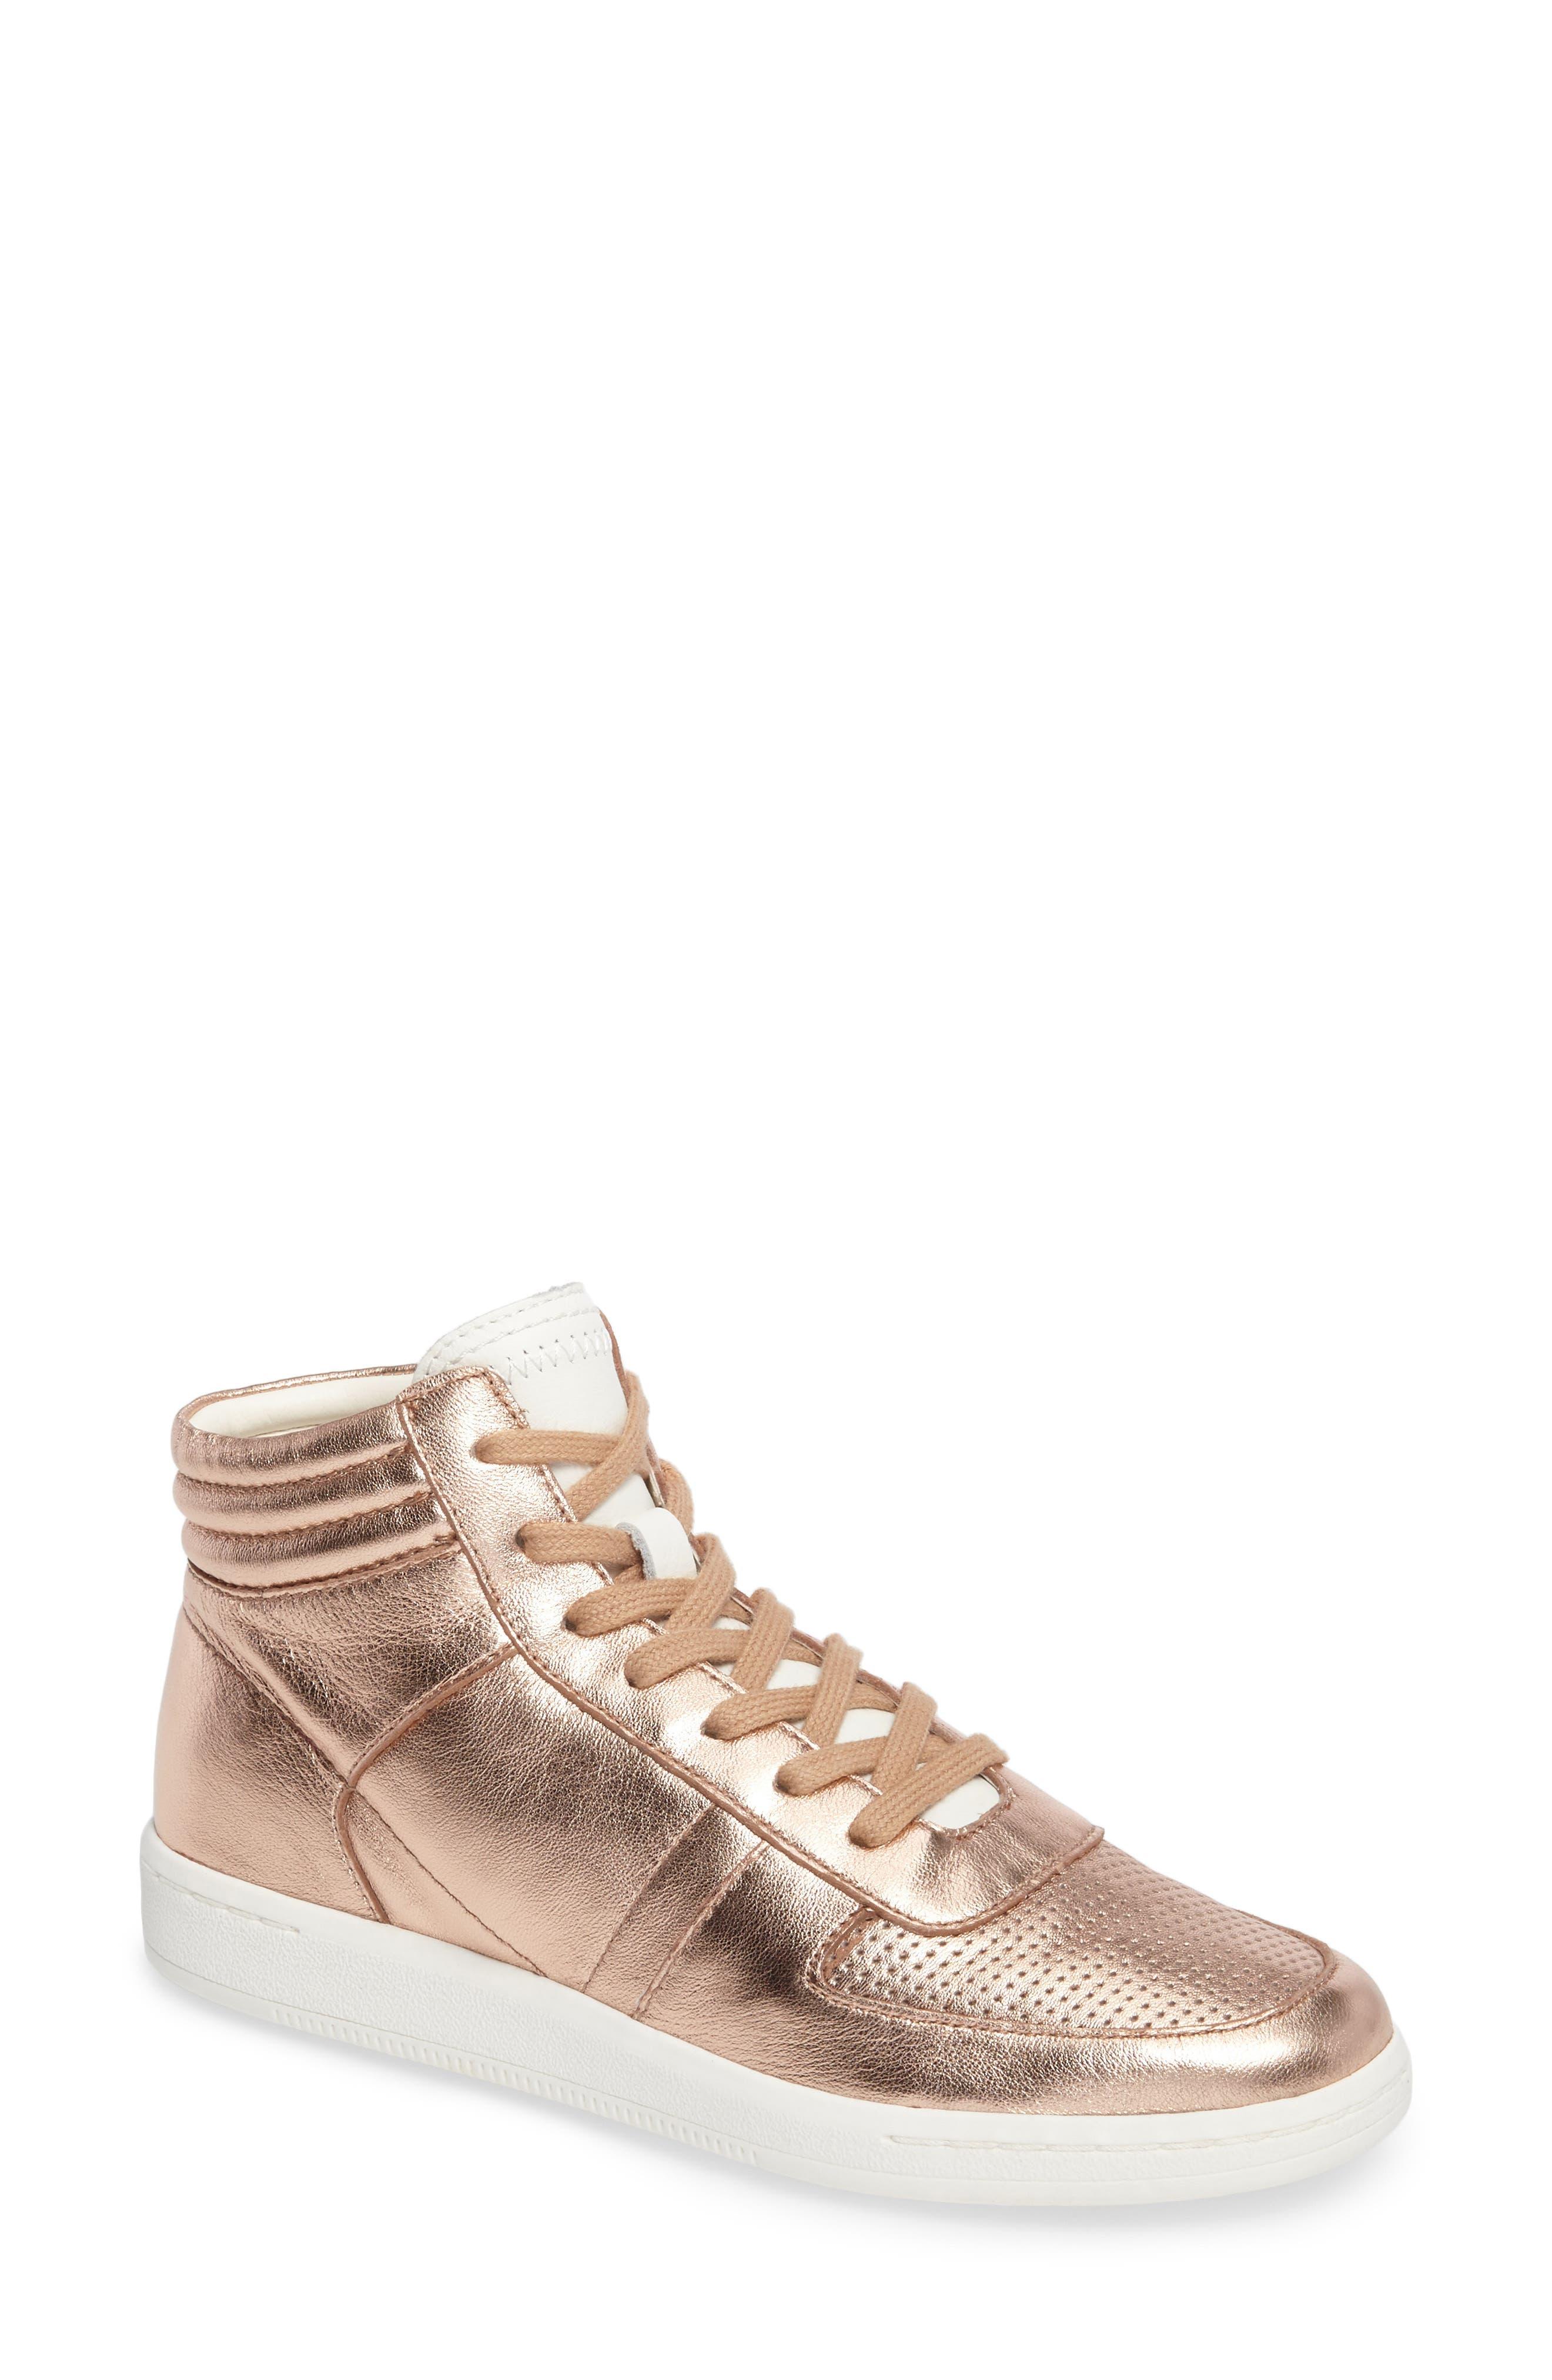 Dolce Vita Nate High Top Sneaker (Women)